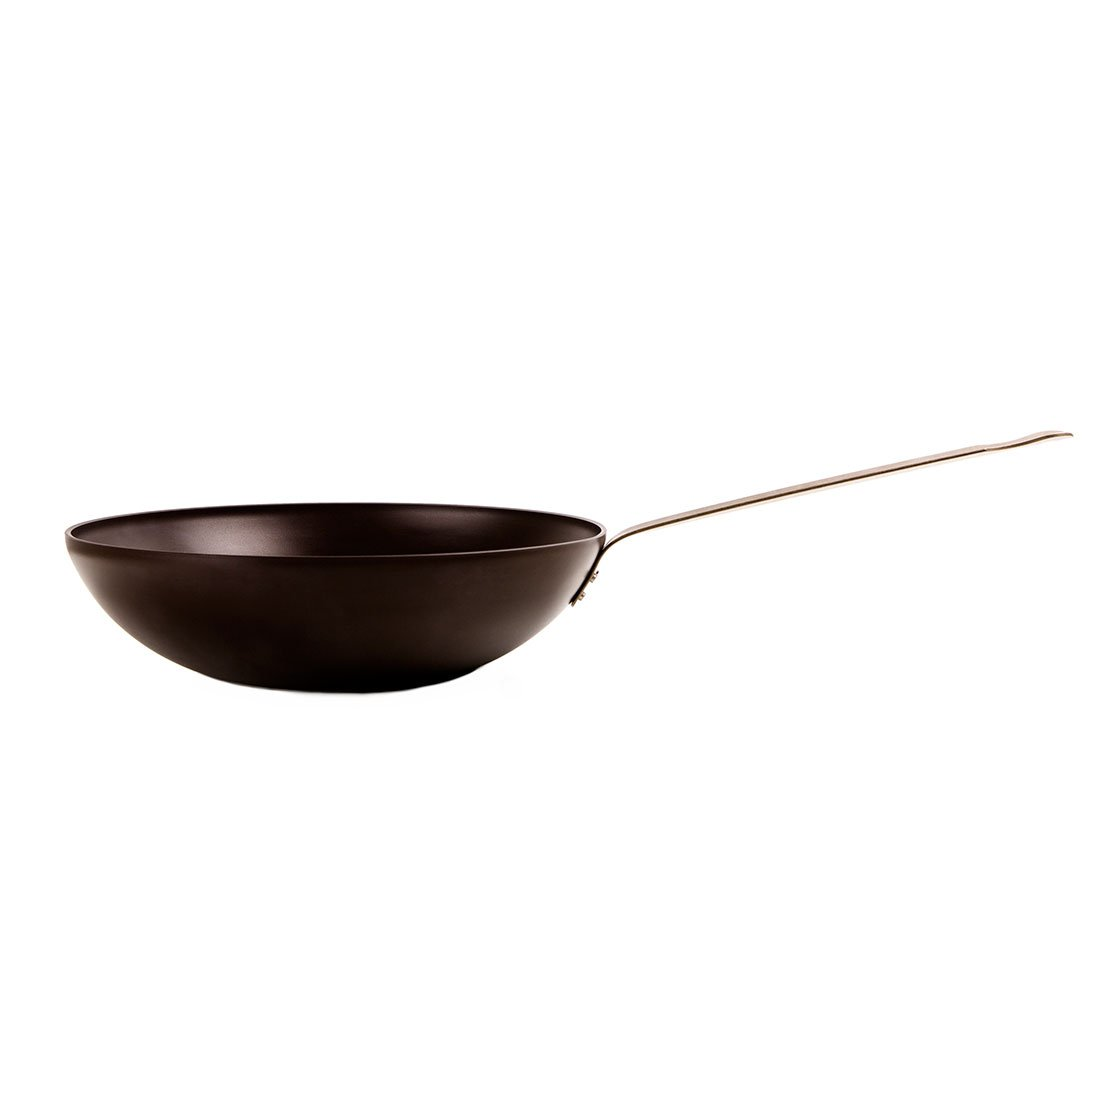 KnIndustrie K7 - Pasta Pan/Wok Ø28 Dark Brown - Bronze